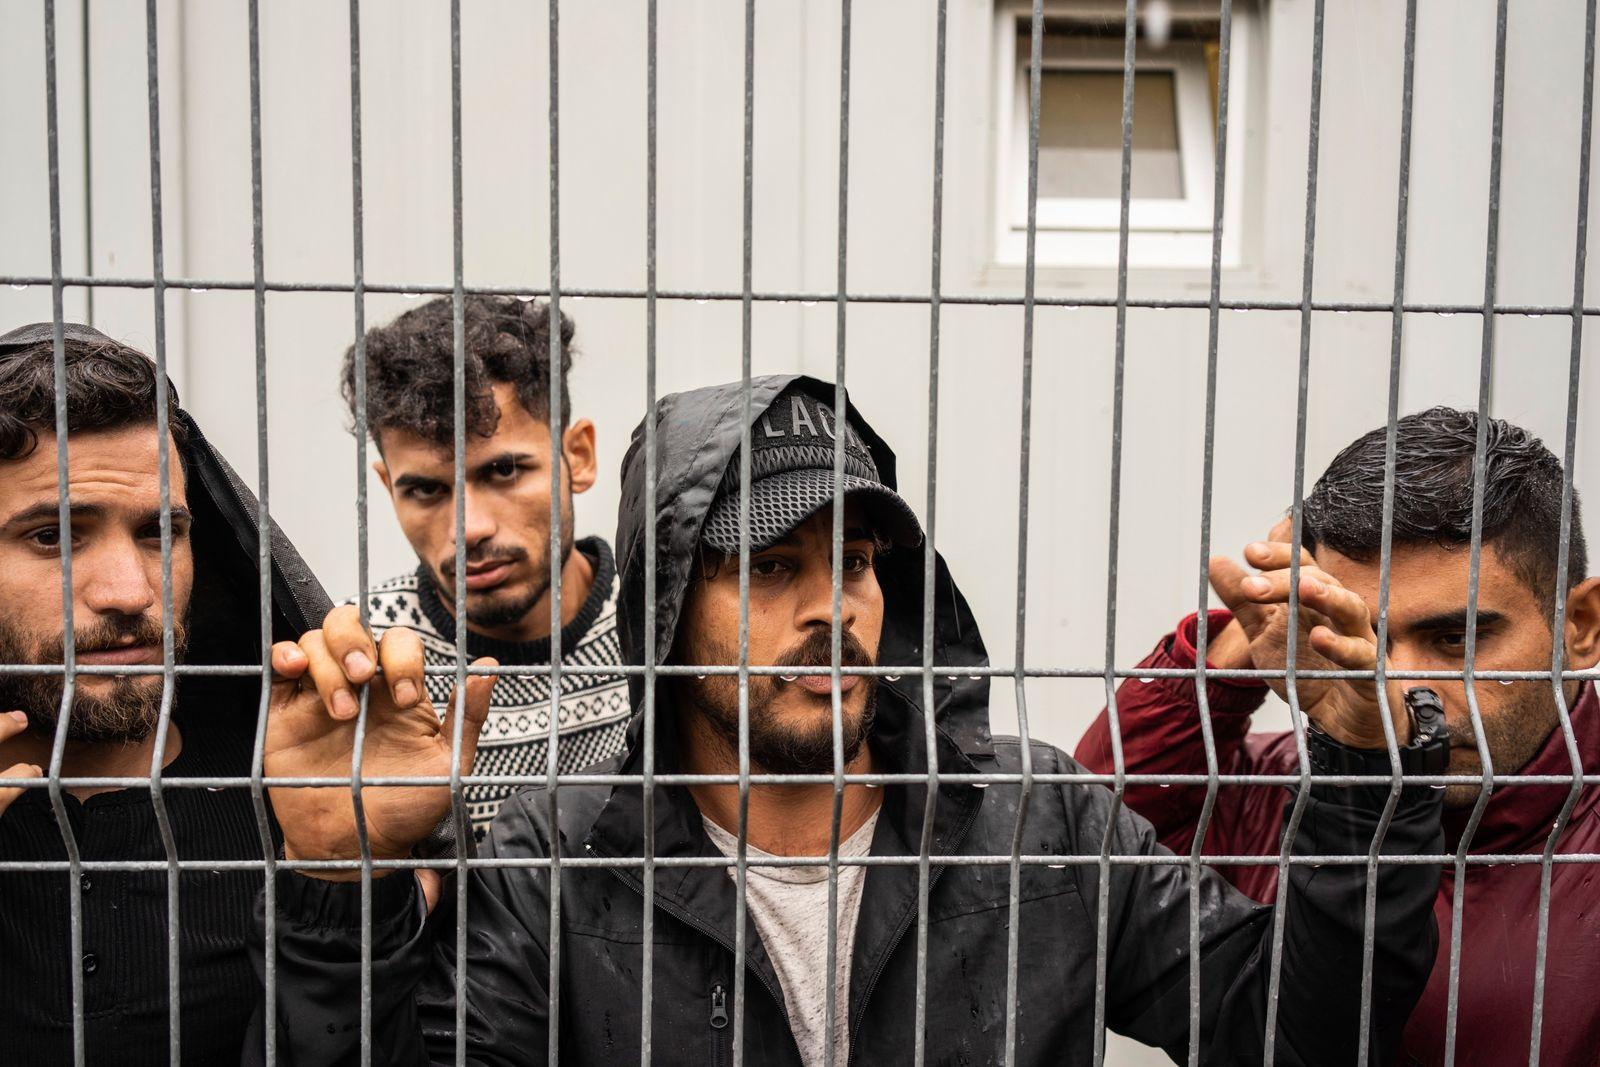 Rūdninkai' refugees camp for Der Spiegel by Severina Venckutė